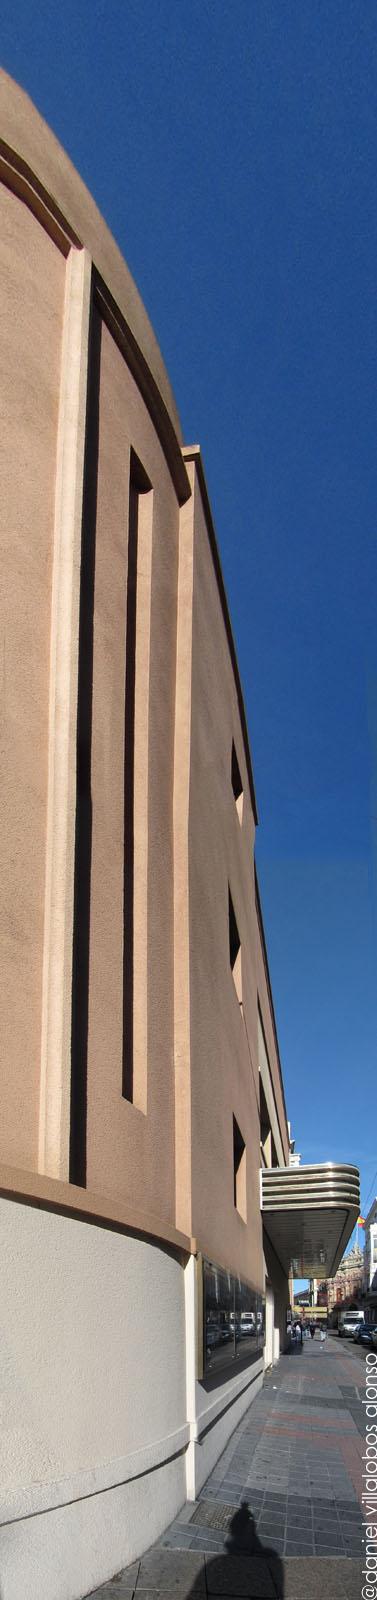 danielvillalobos-cines-digitalphotographies-modernarchitecture-44